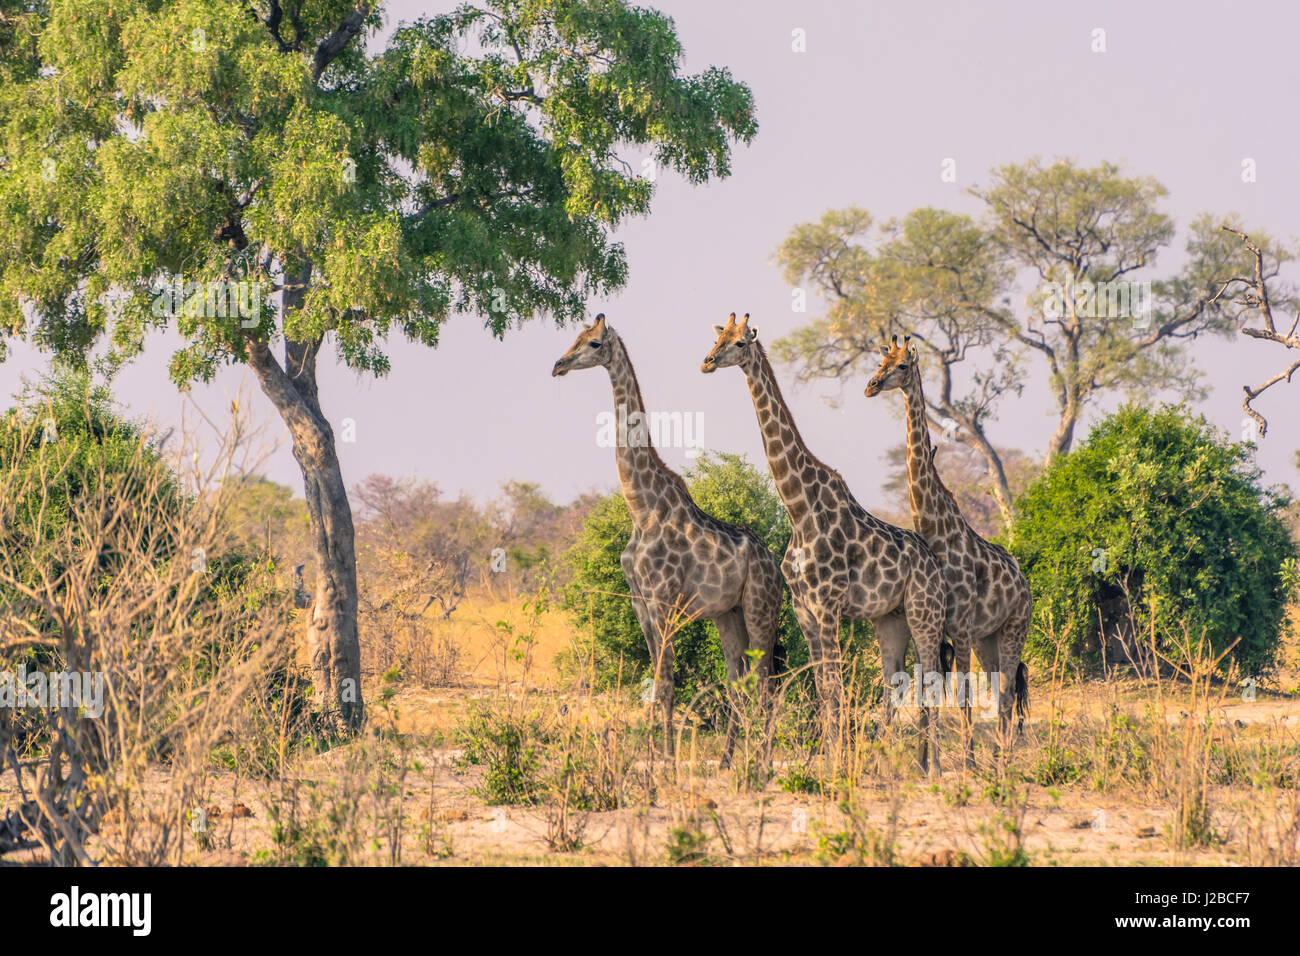 Botswana. Chobe National Park. Savuti. Giraffes intently watching a hidden lion in the bush. - Stock Image